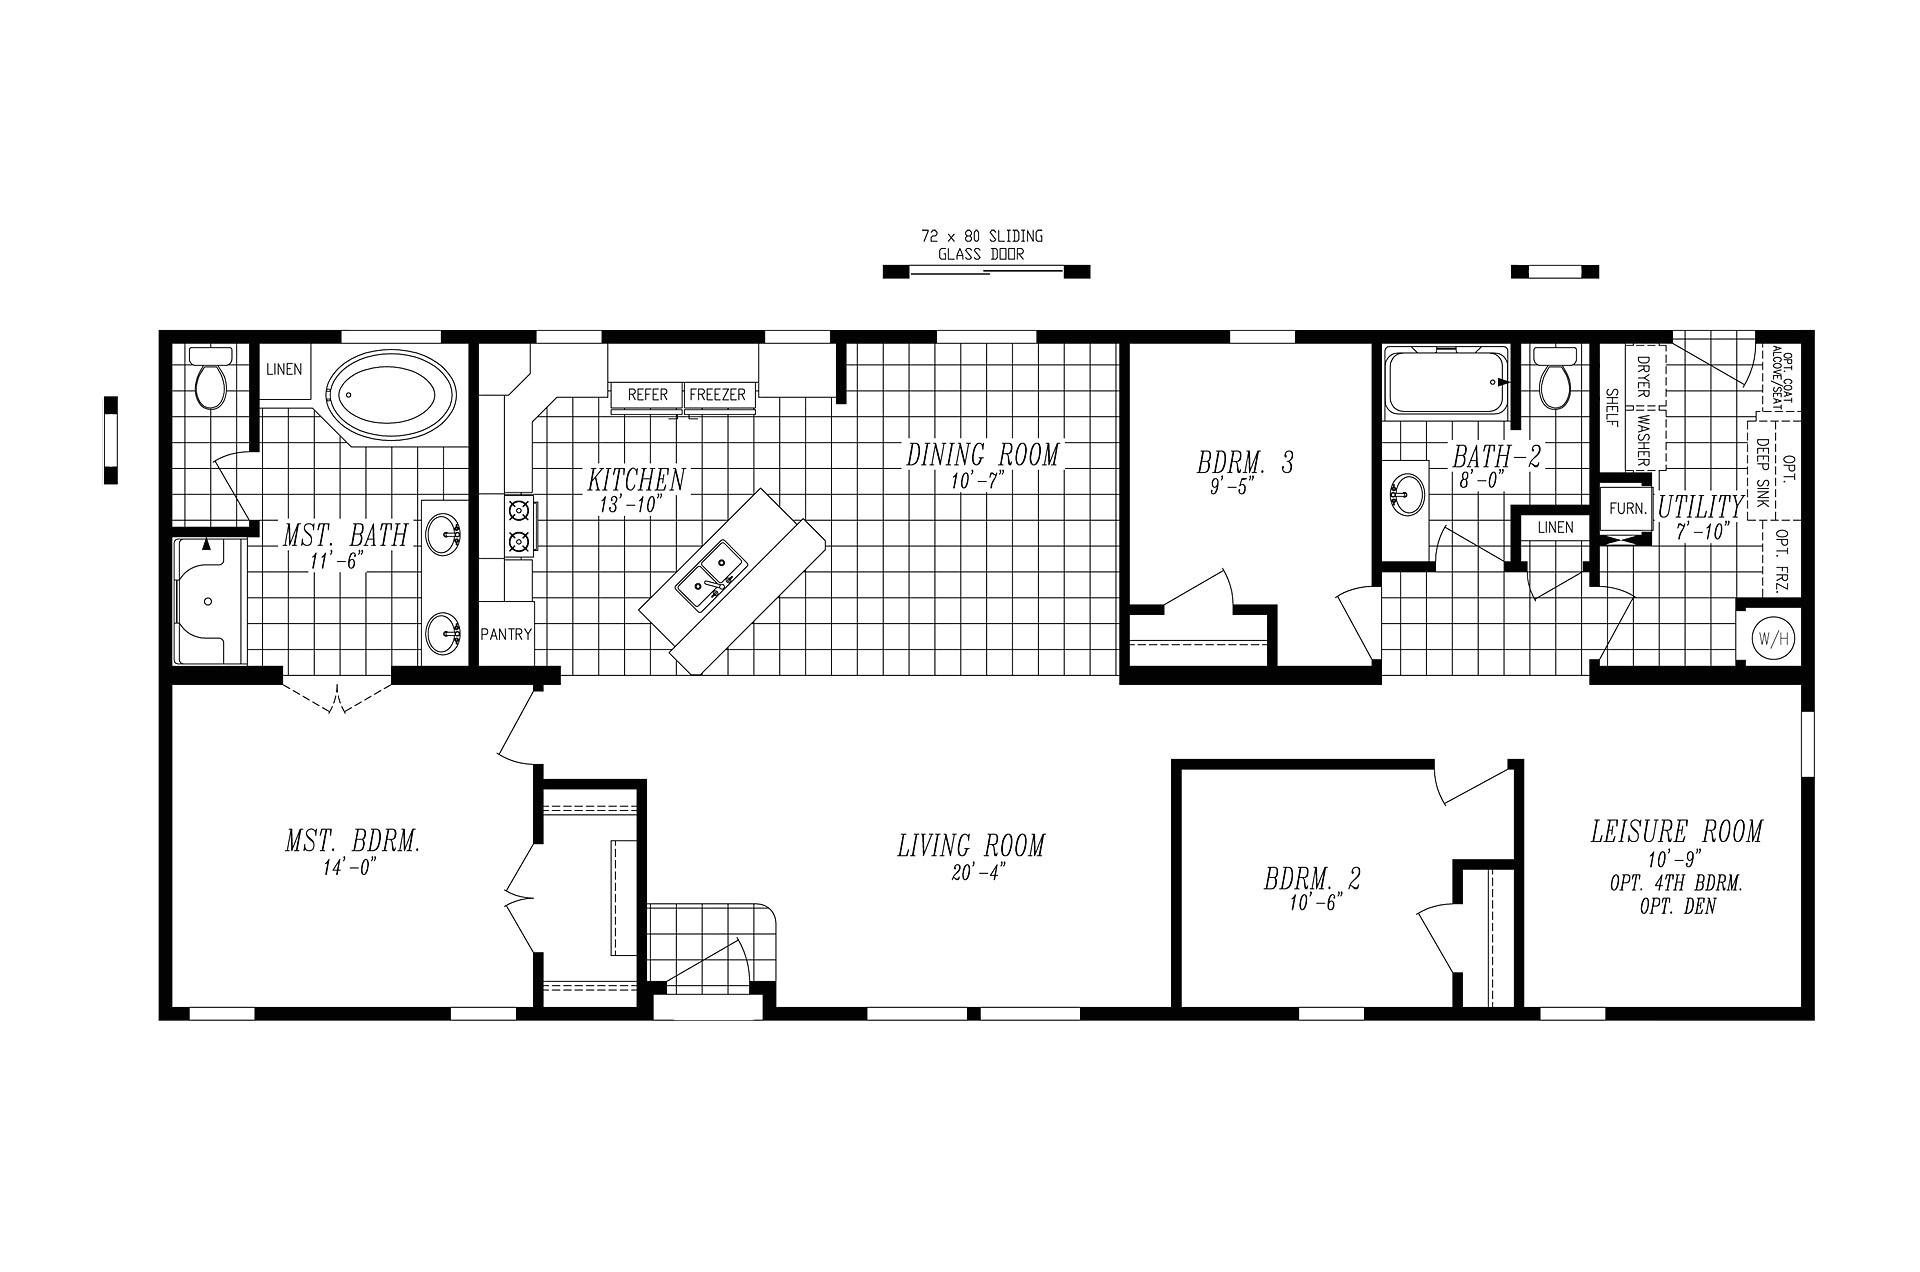 marlette homes floor plans